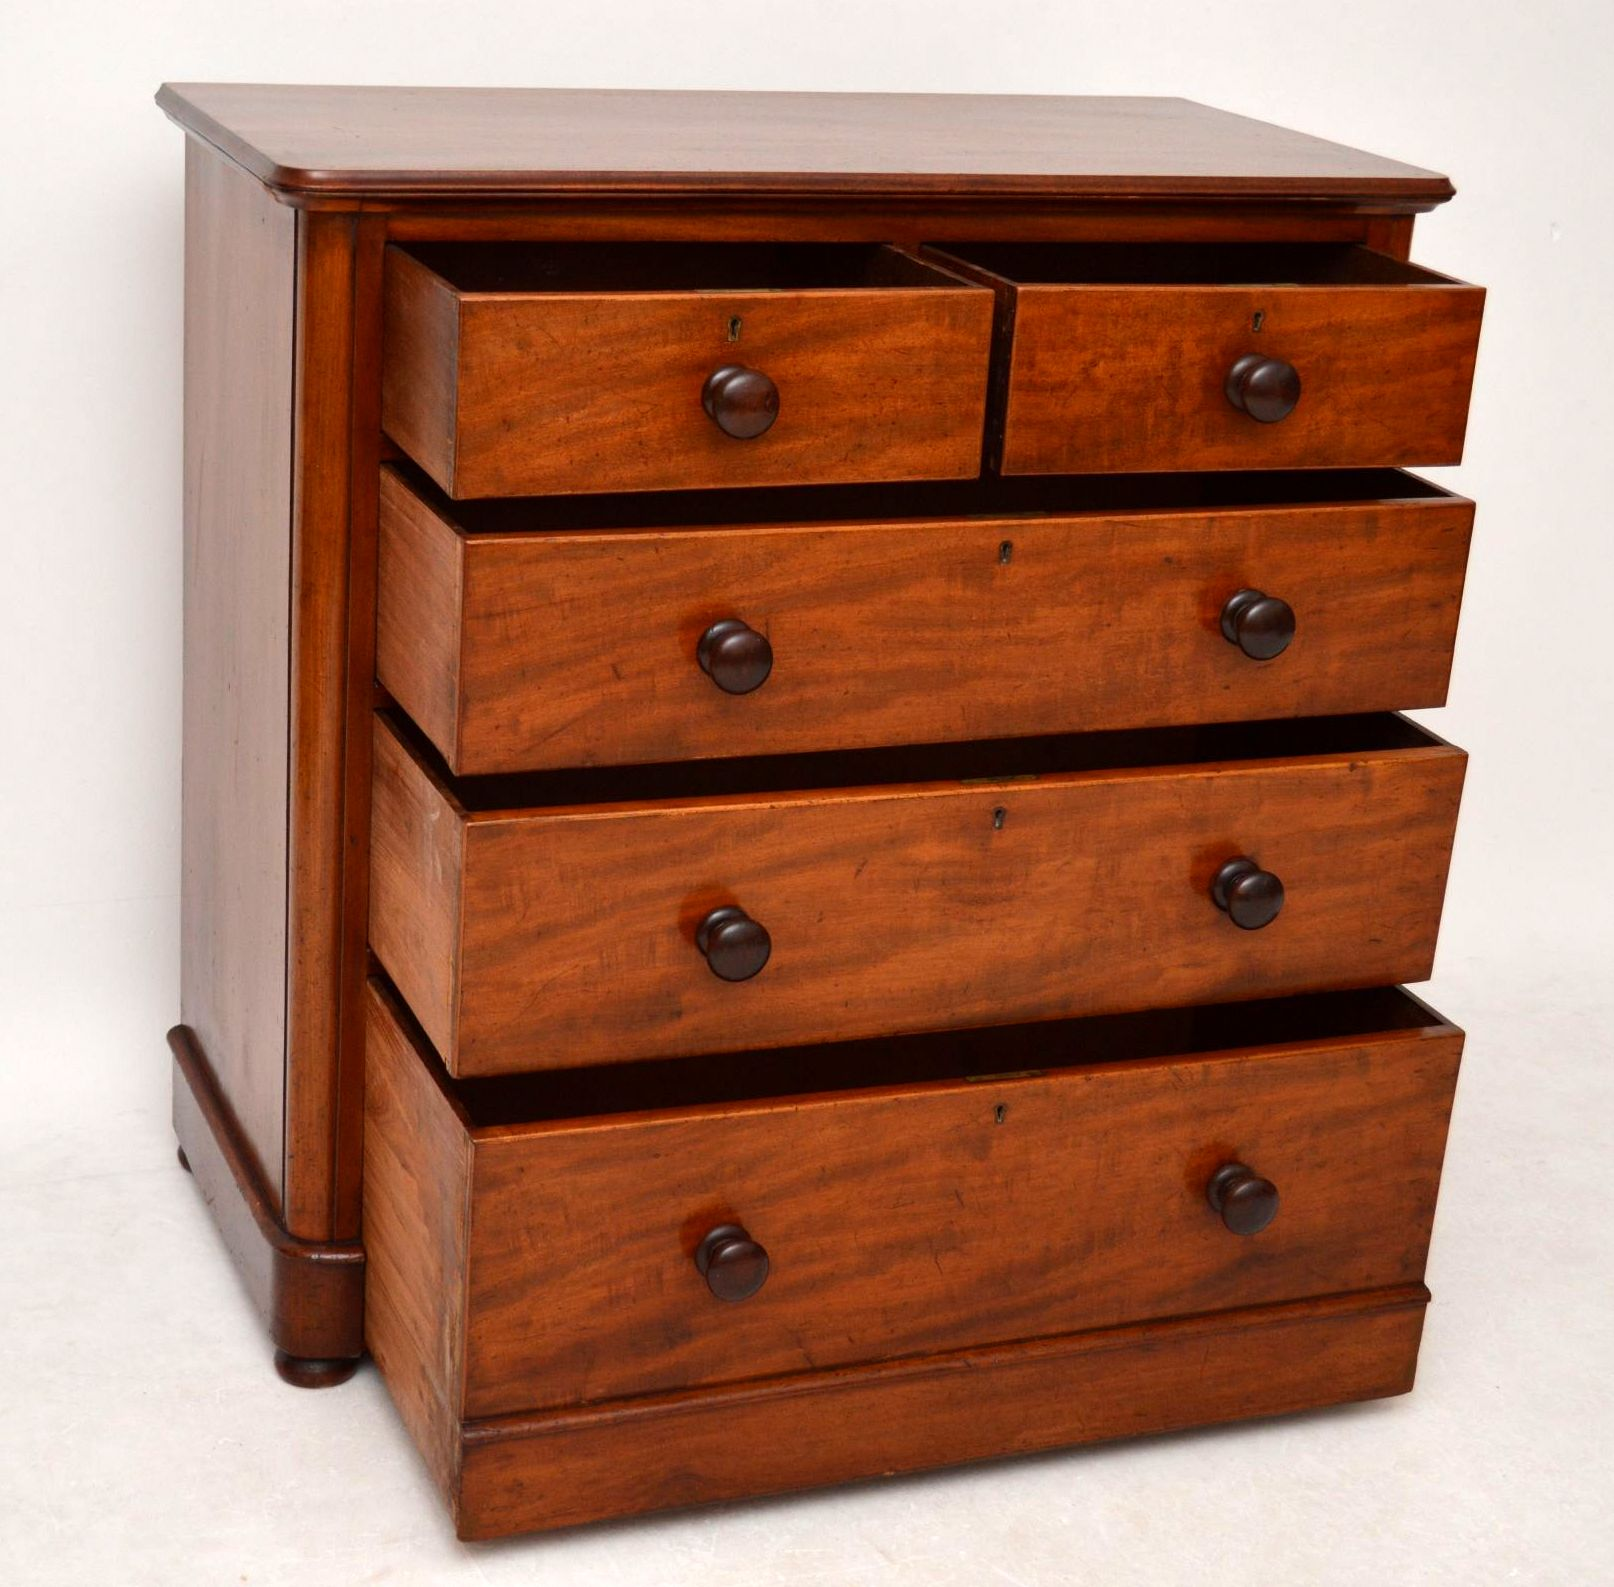 antike kommode aus eibenholz victorian. Black Bedroom Furniture Sets. Home Design Ideas